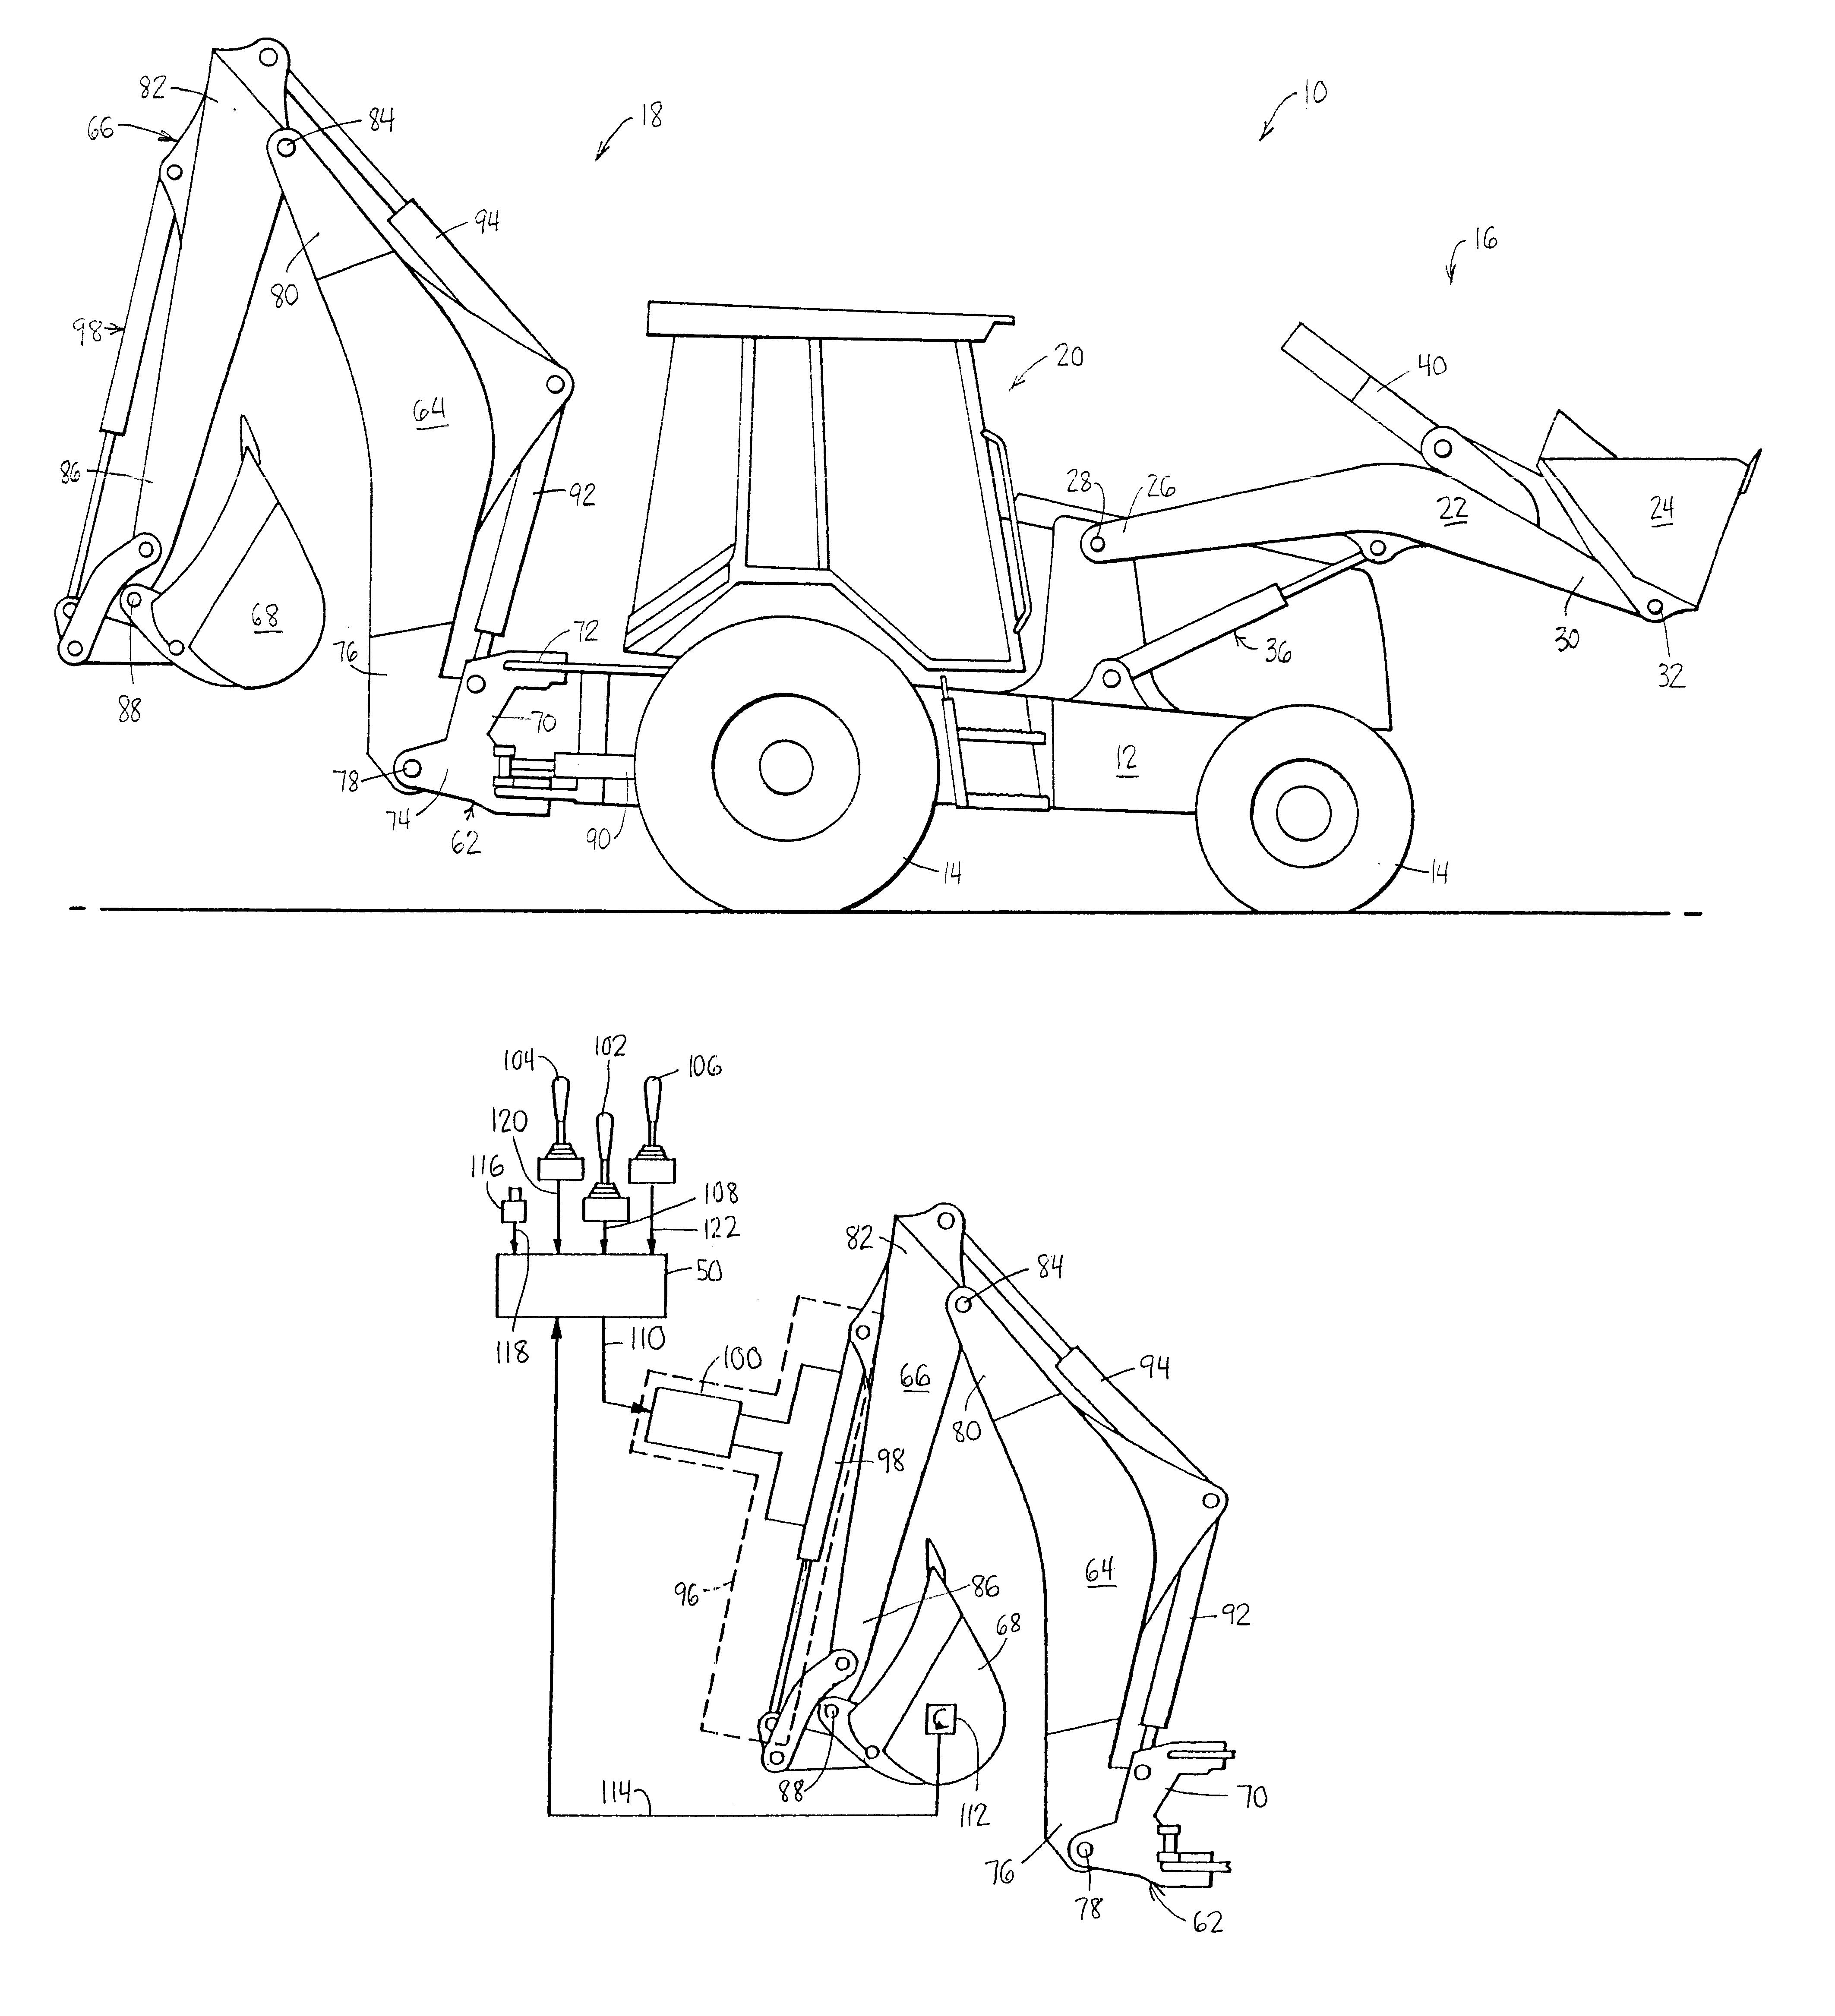 John Deere 620 Hydraulic Steering Diagram Automotive Wiring For 6310 420 Free Dohn 4430 2010